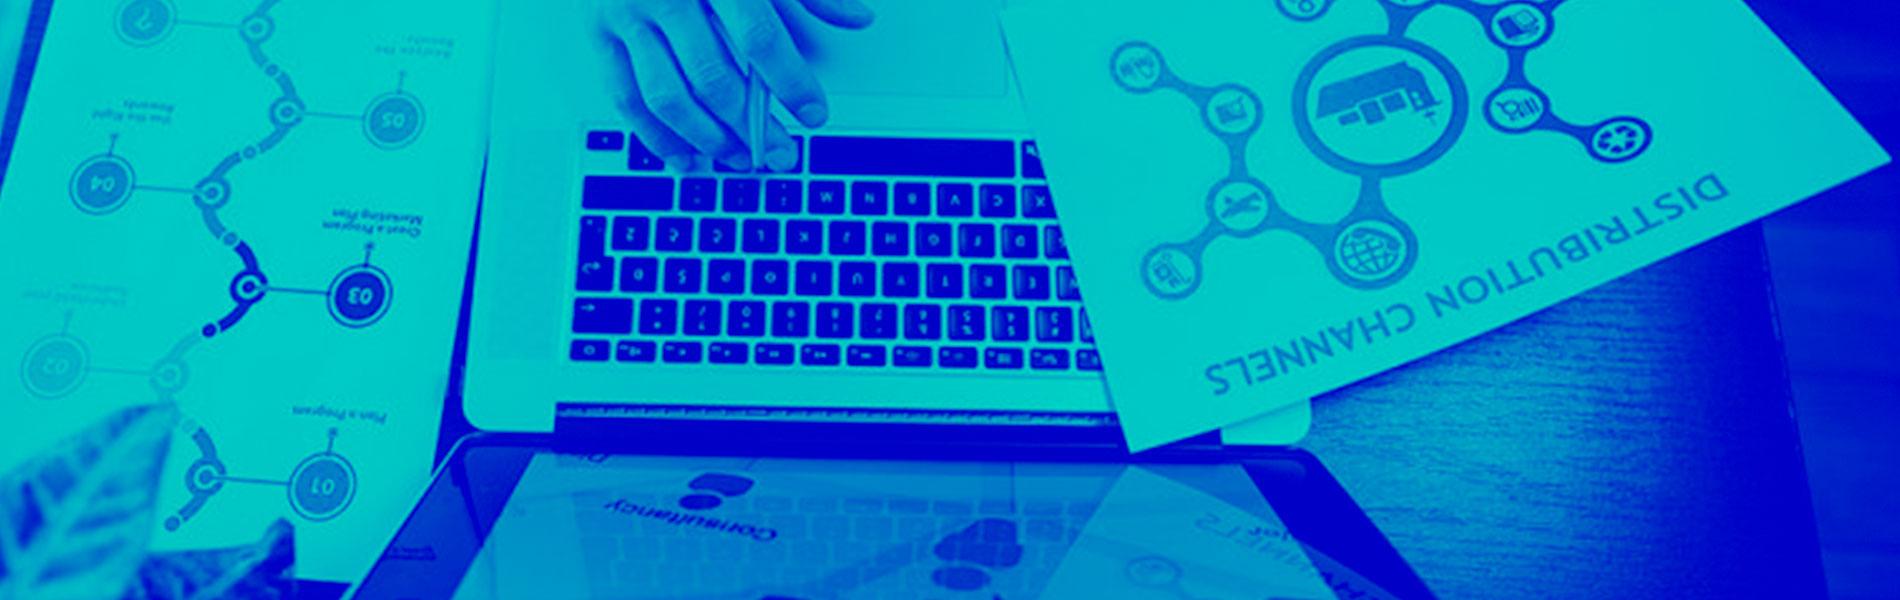 ¿Vale la pena estudiar marketing online? ¡Descúbrelo!